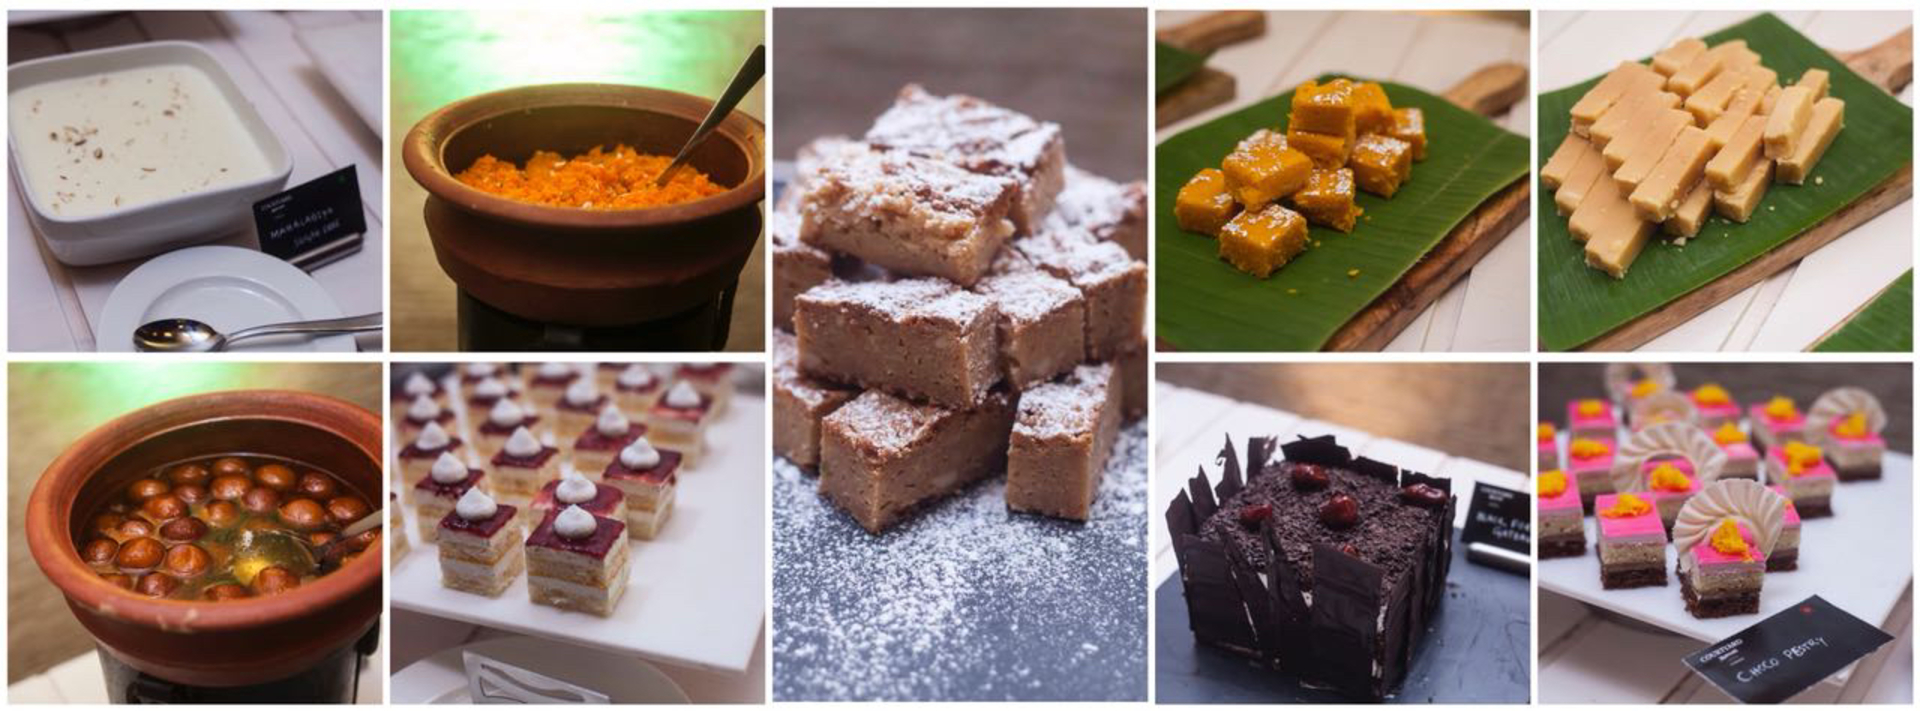 Purnis Food Blog - WhatsApp Image 2018-05-17 at 8